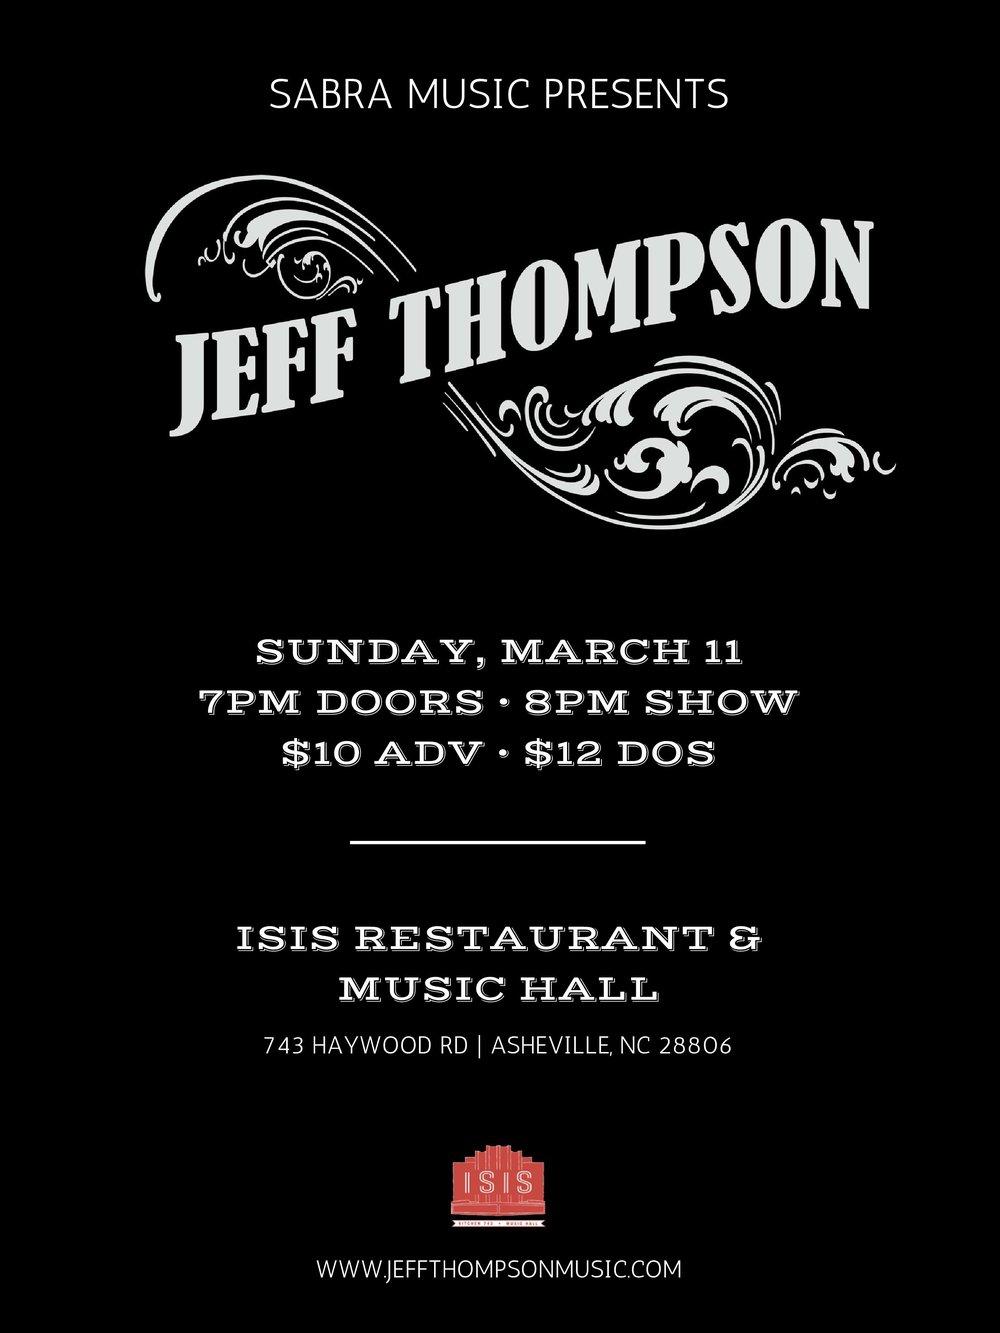 jeff thompson 3.11 (1)-page-001.jpg